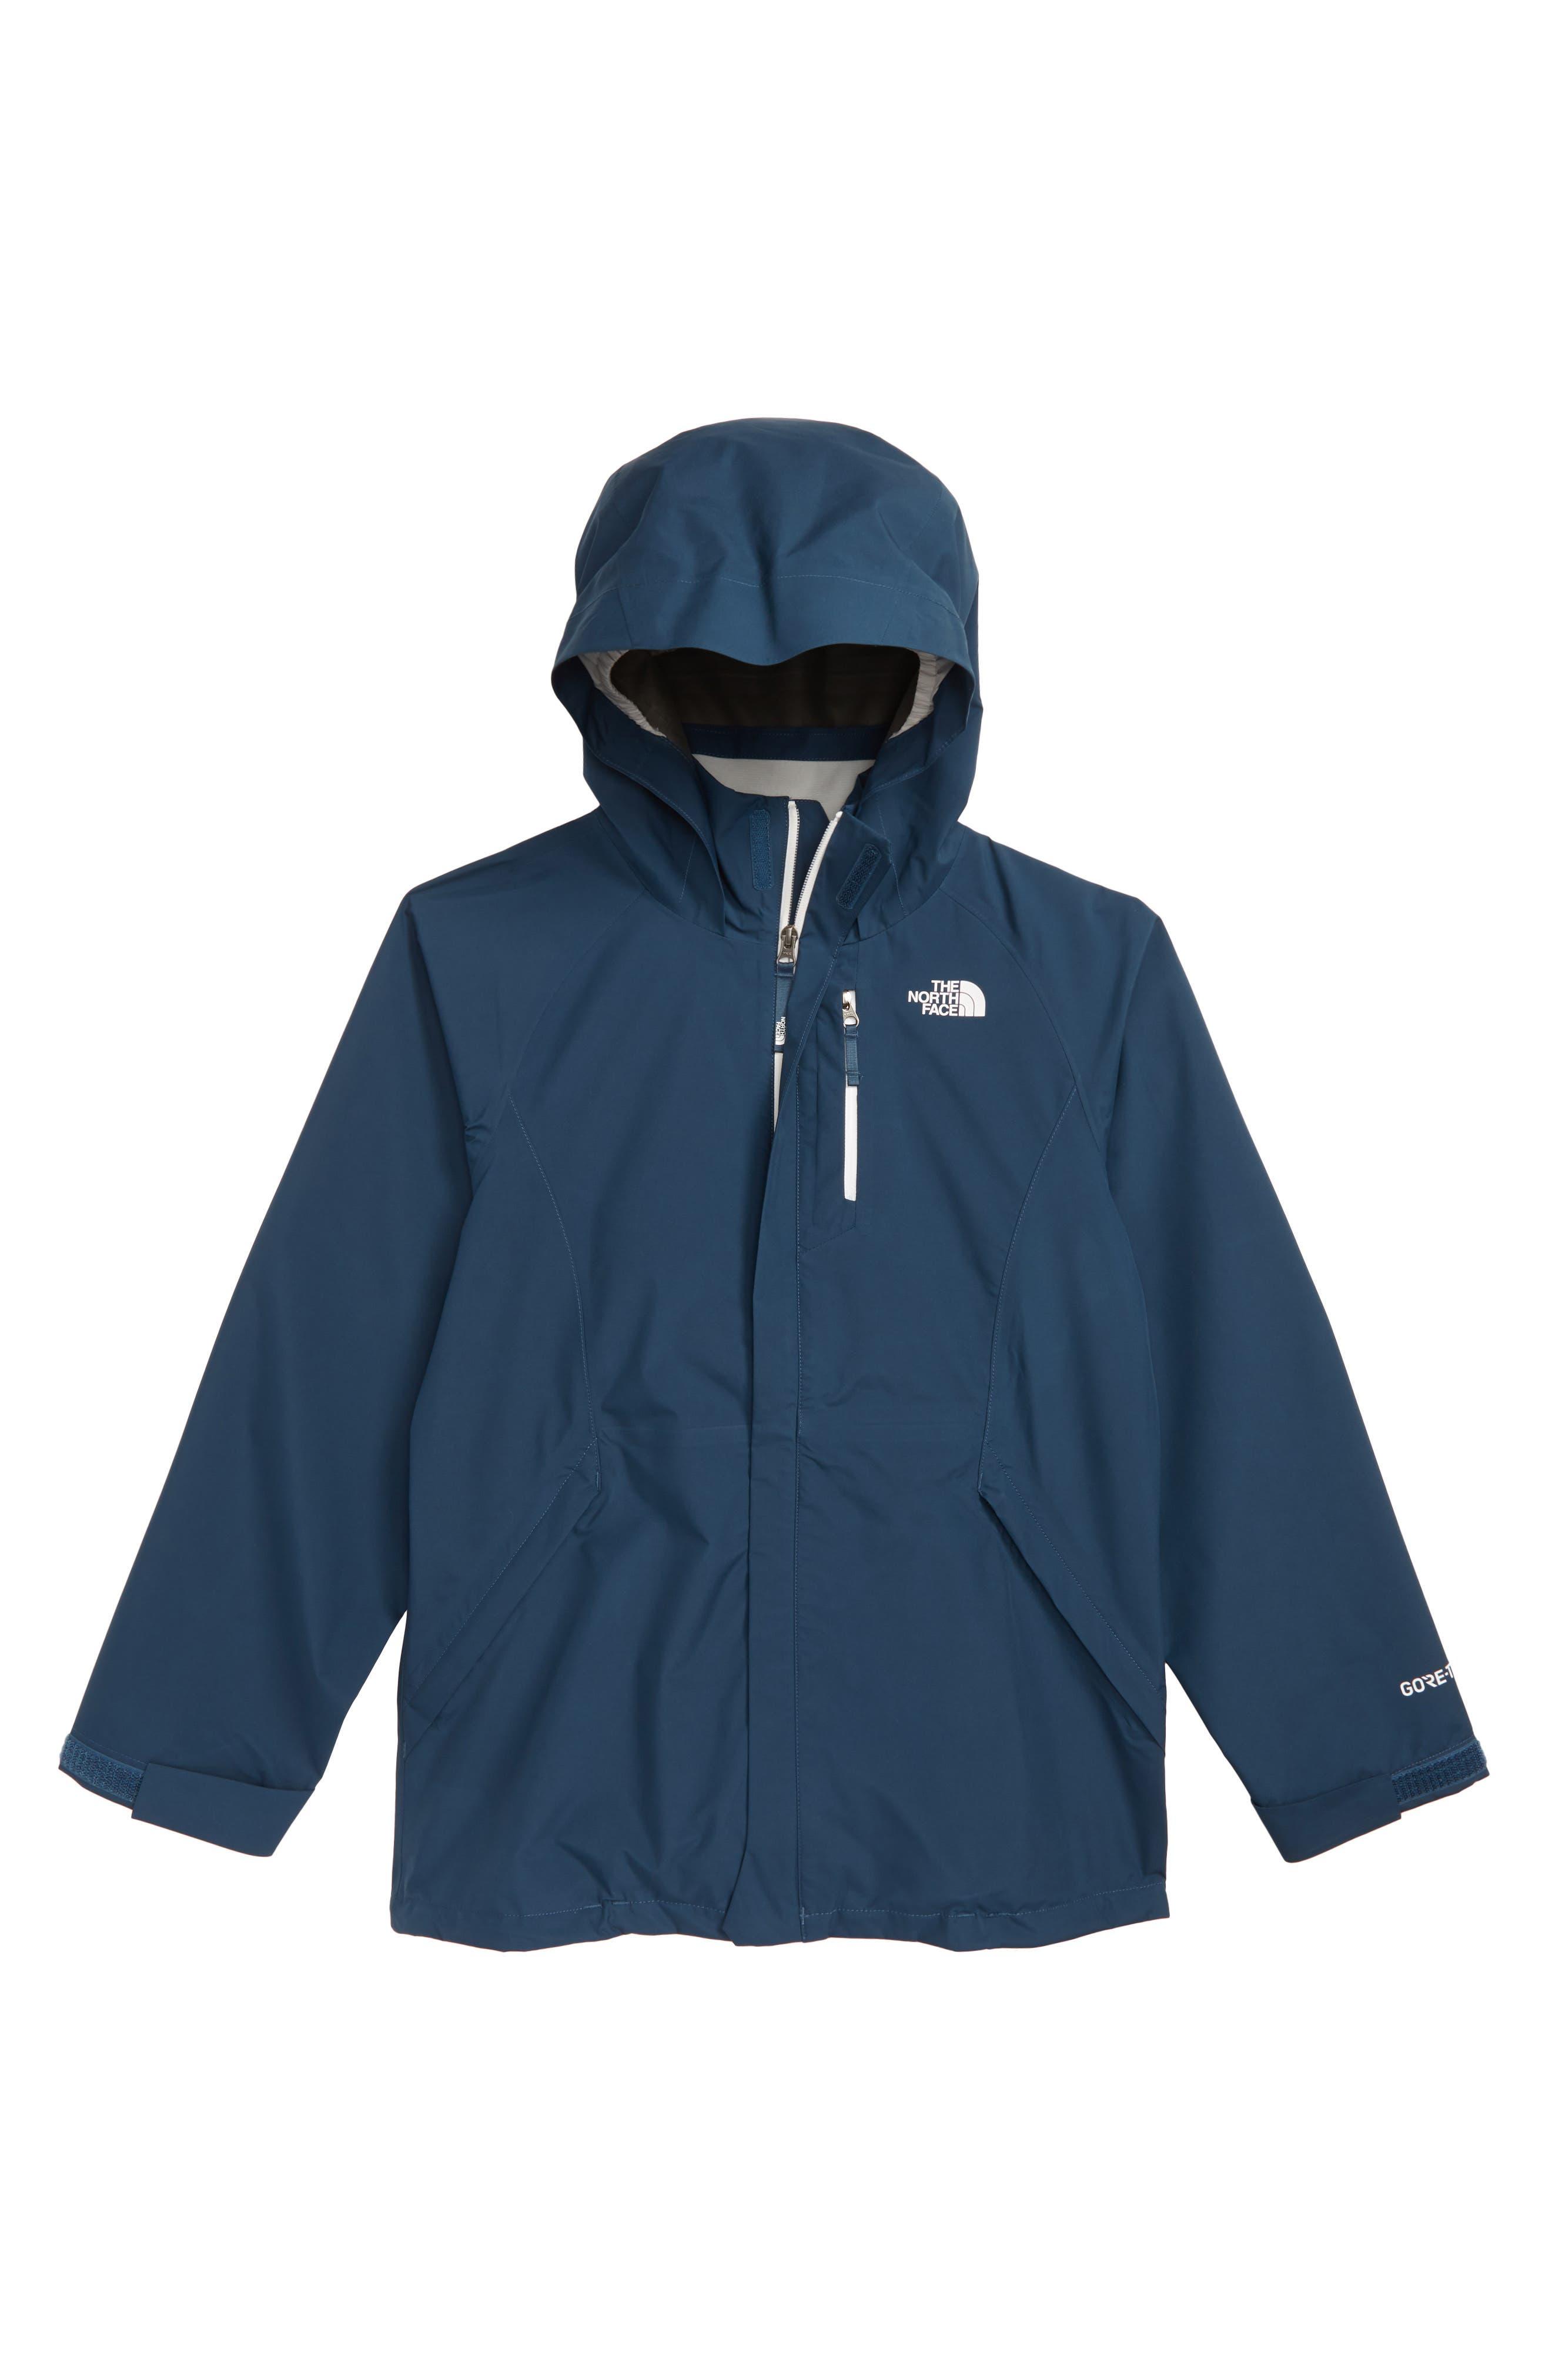 Dryzzle Waterproof Jacket,                         Main,                         color,